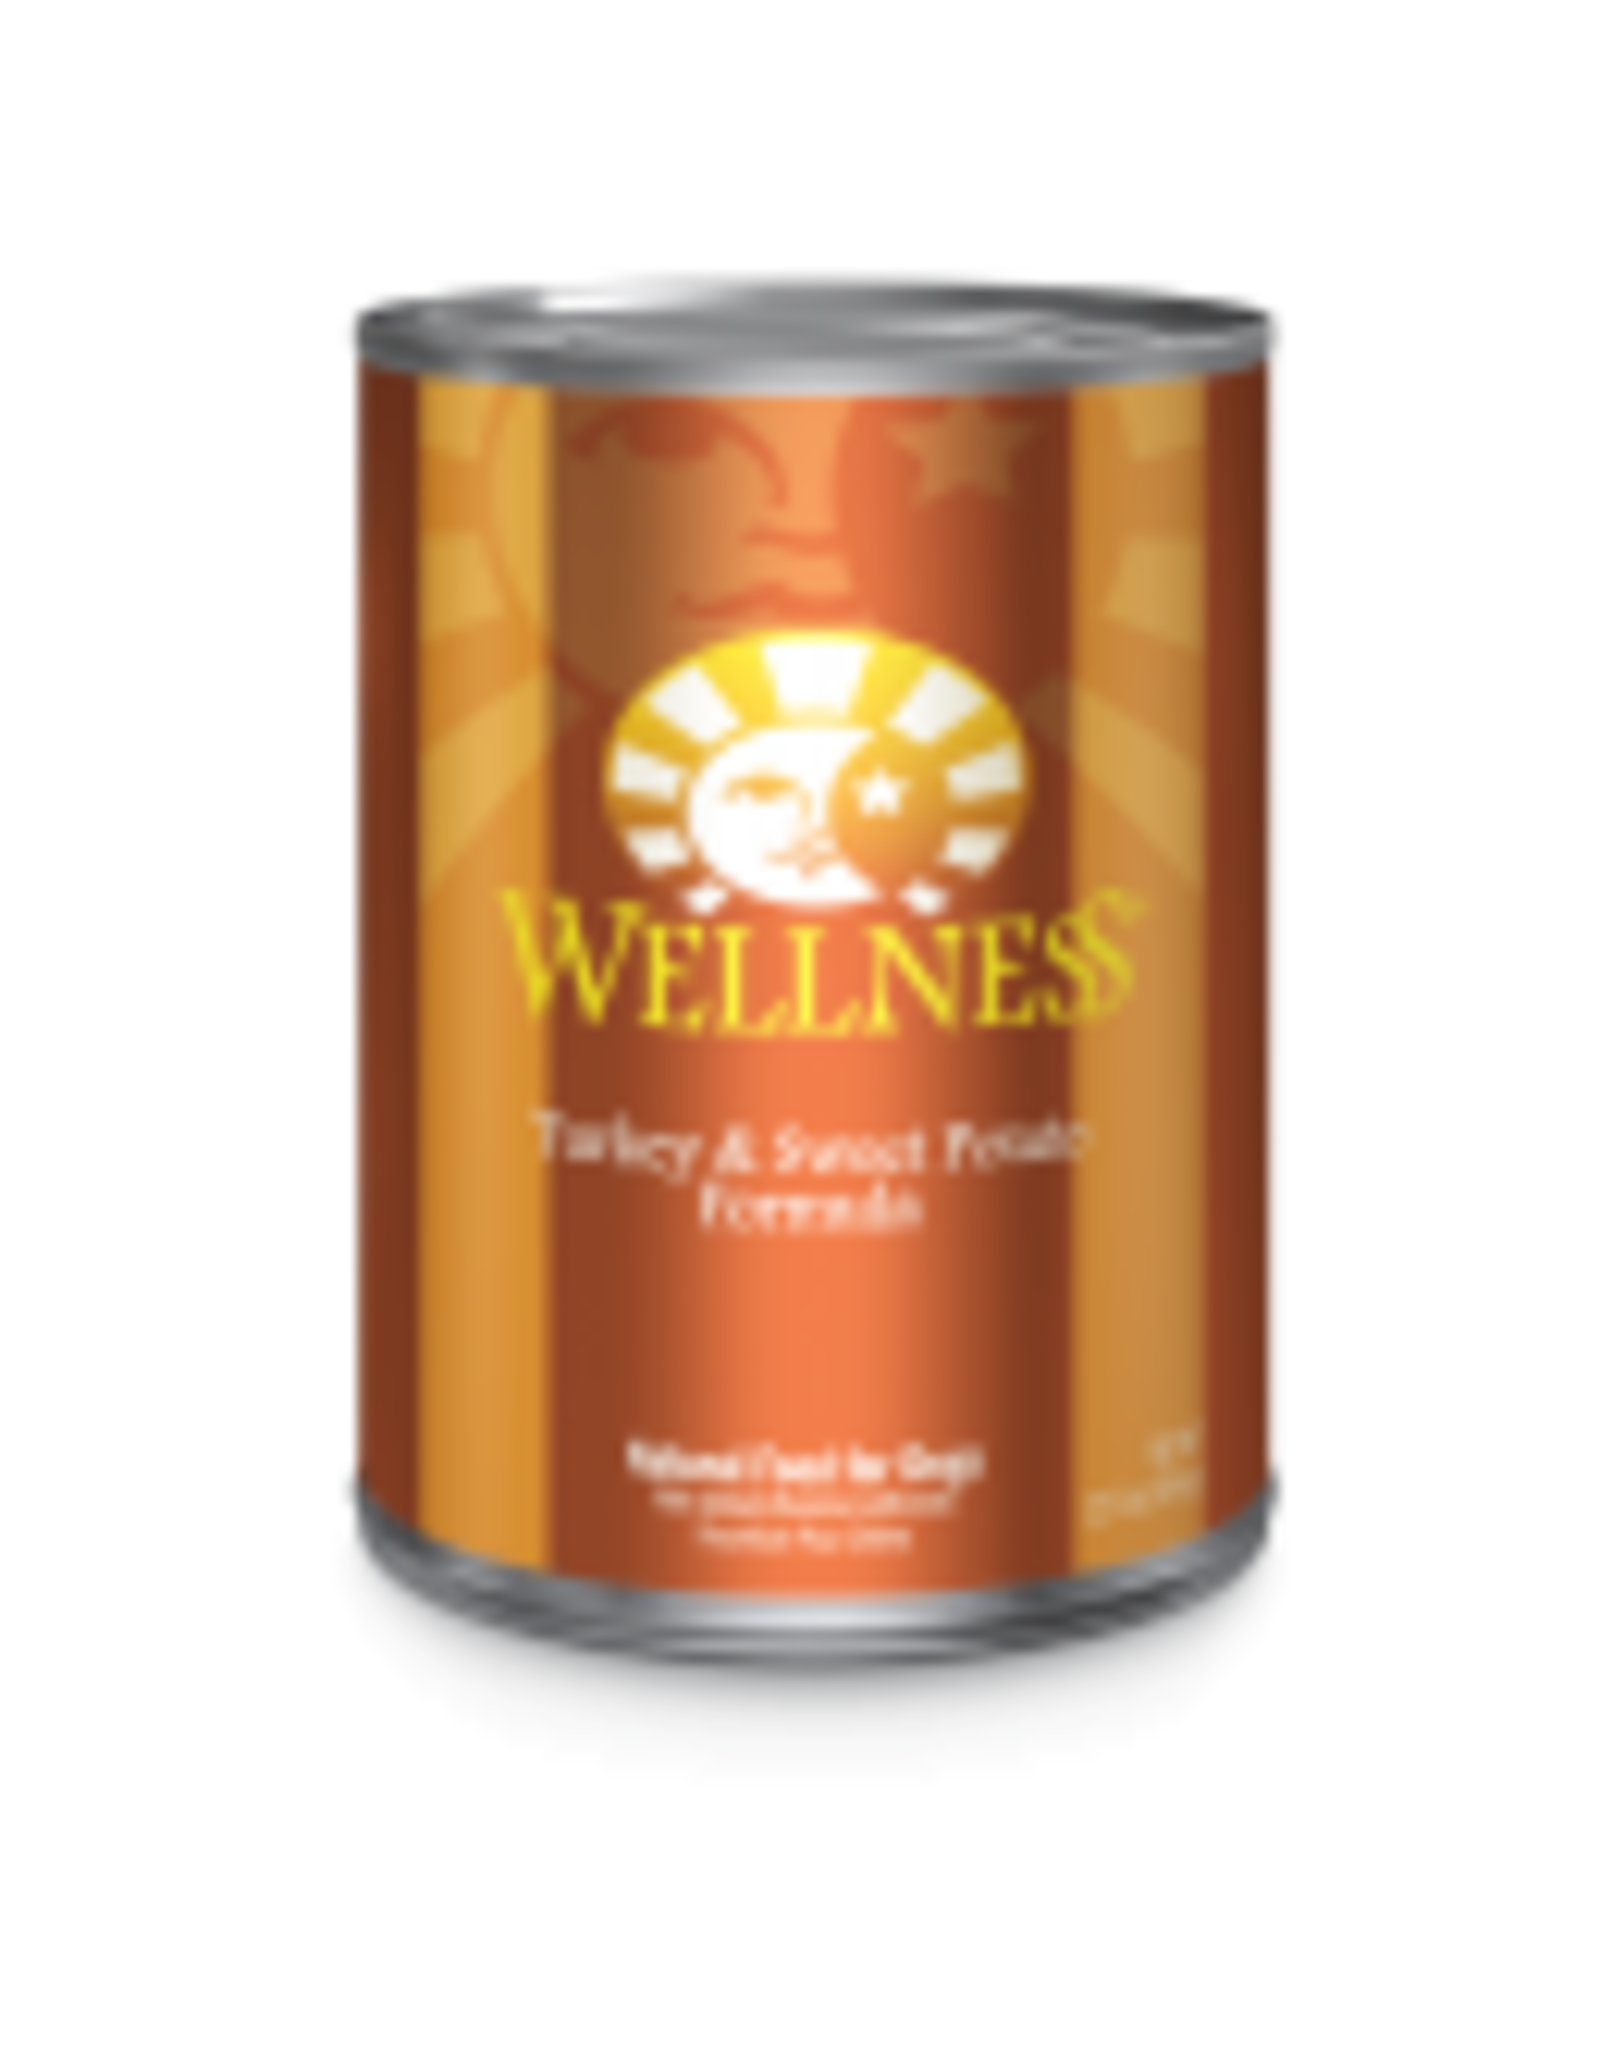 Wellness Wellness Canine Turkey 12.5oz